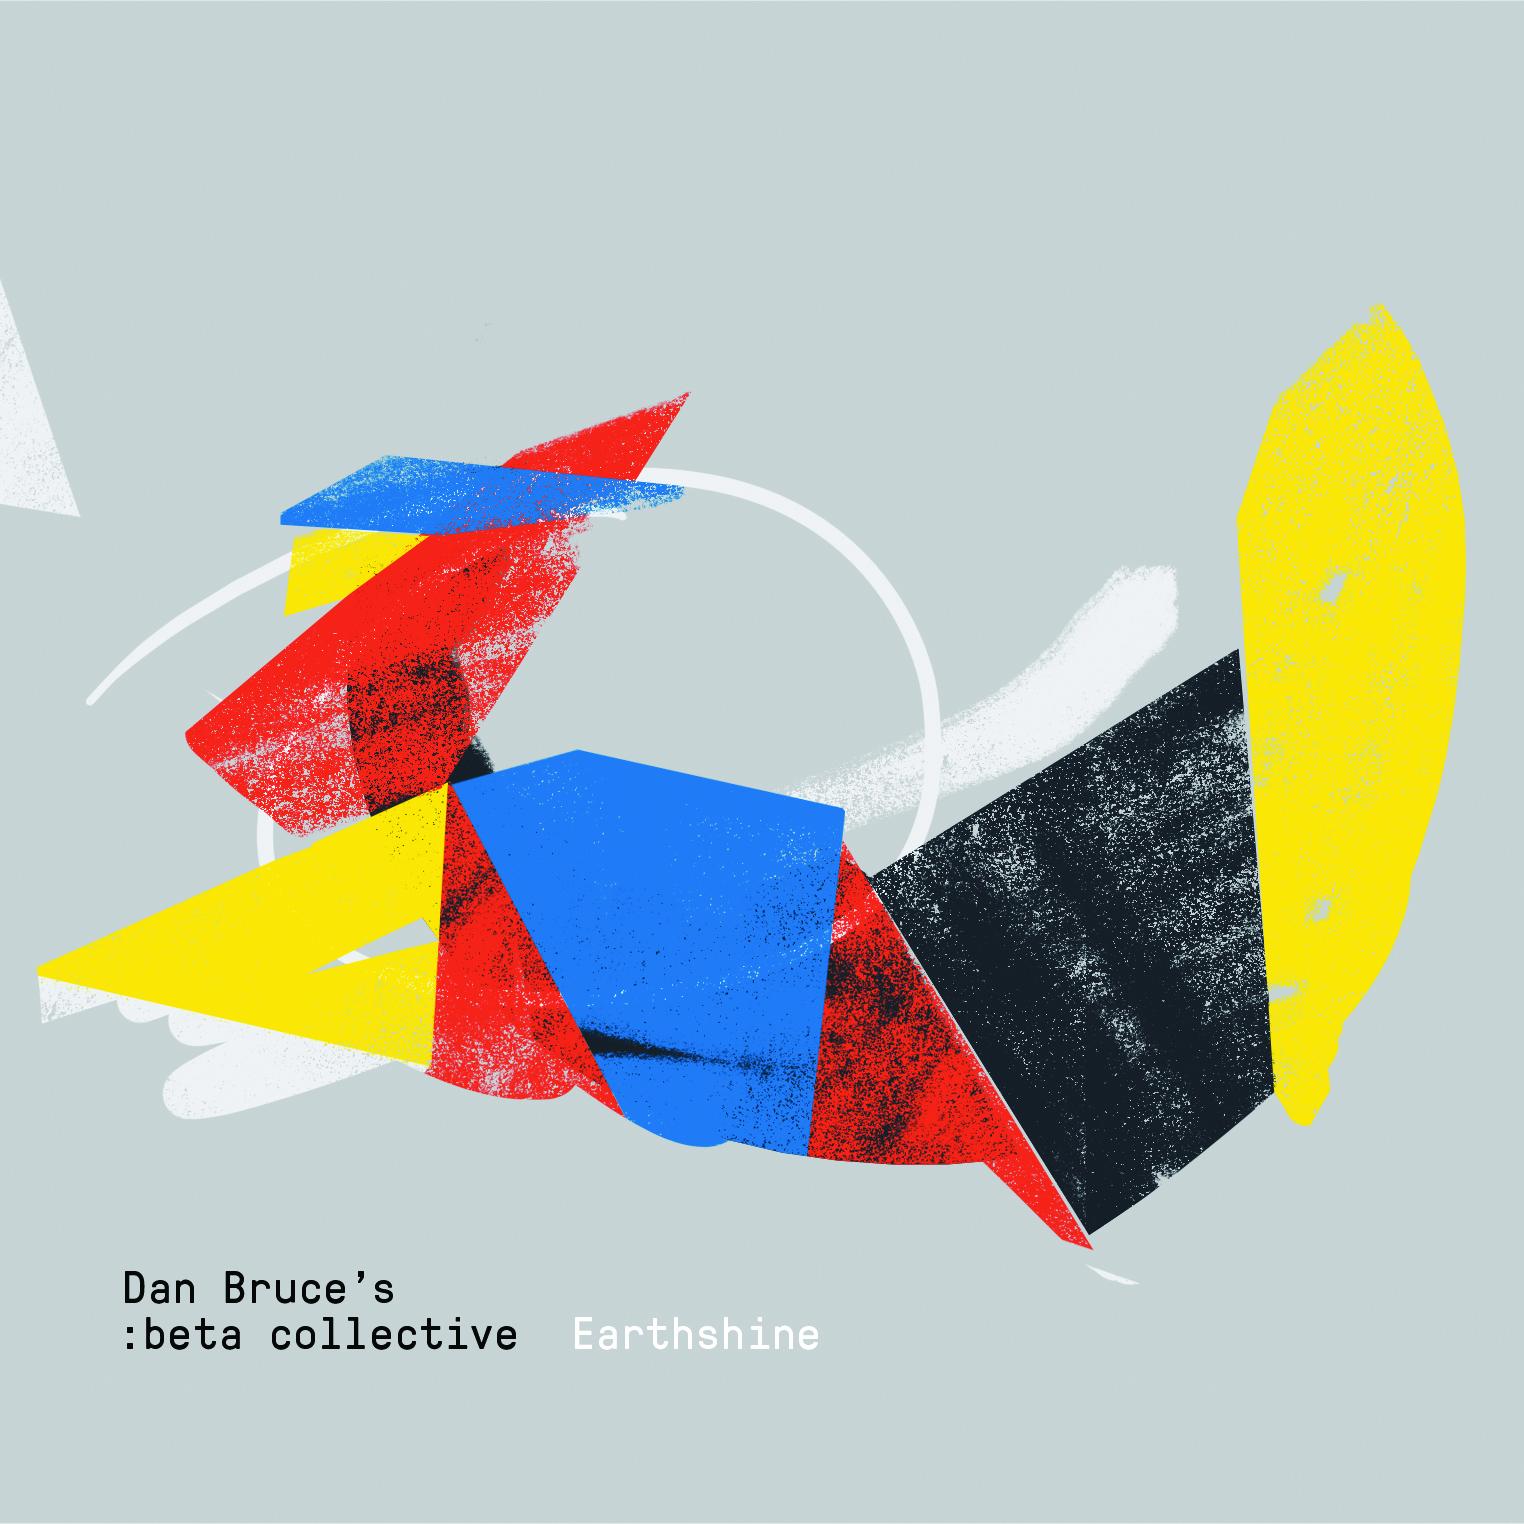 Dan Bruce's :beta collective | Earthshine